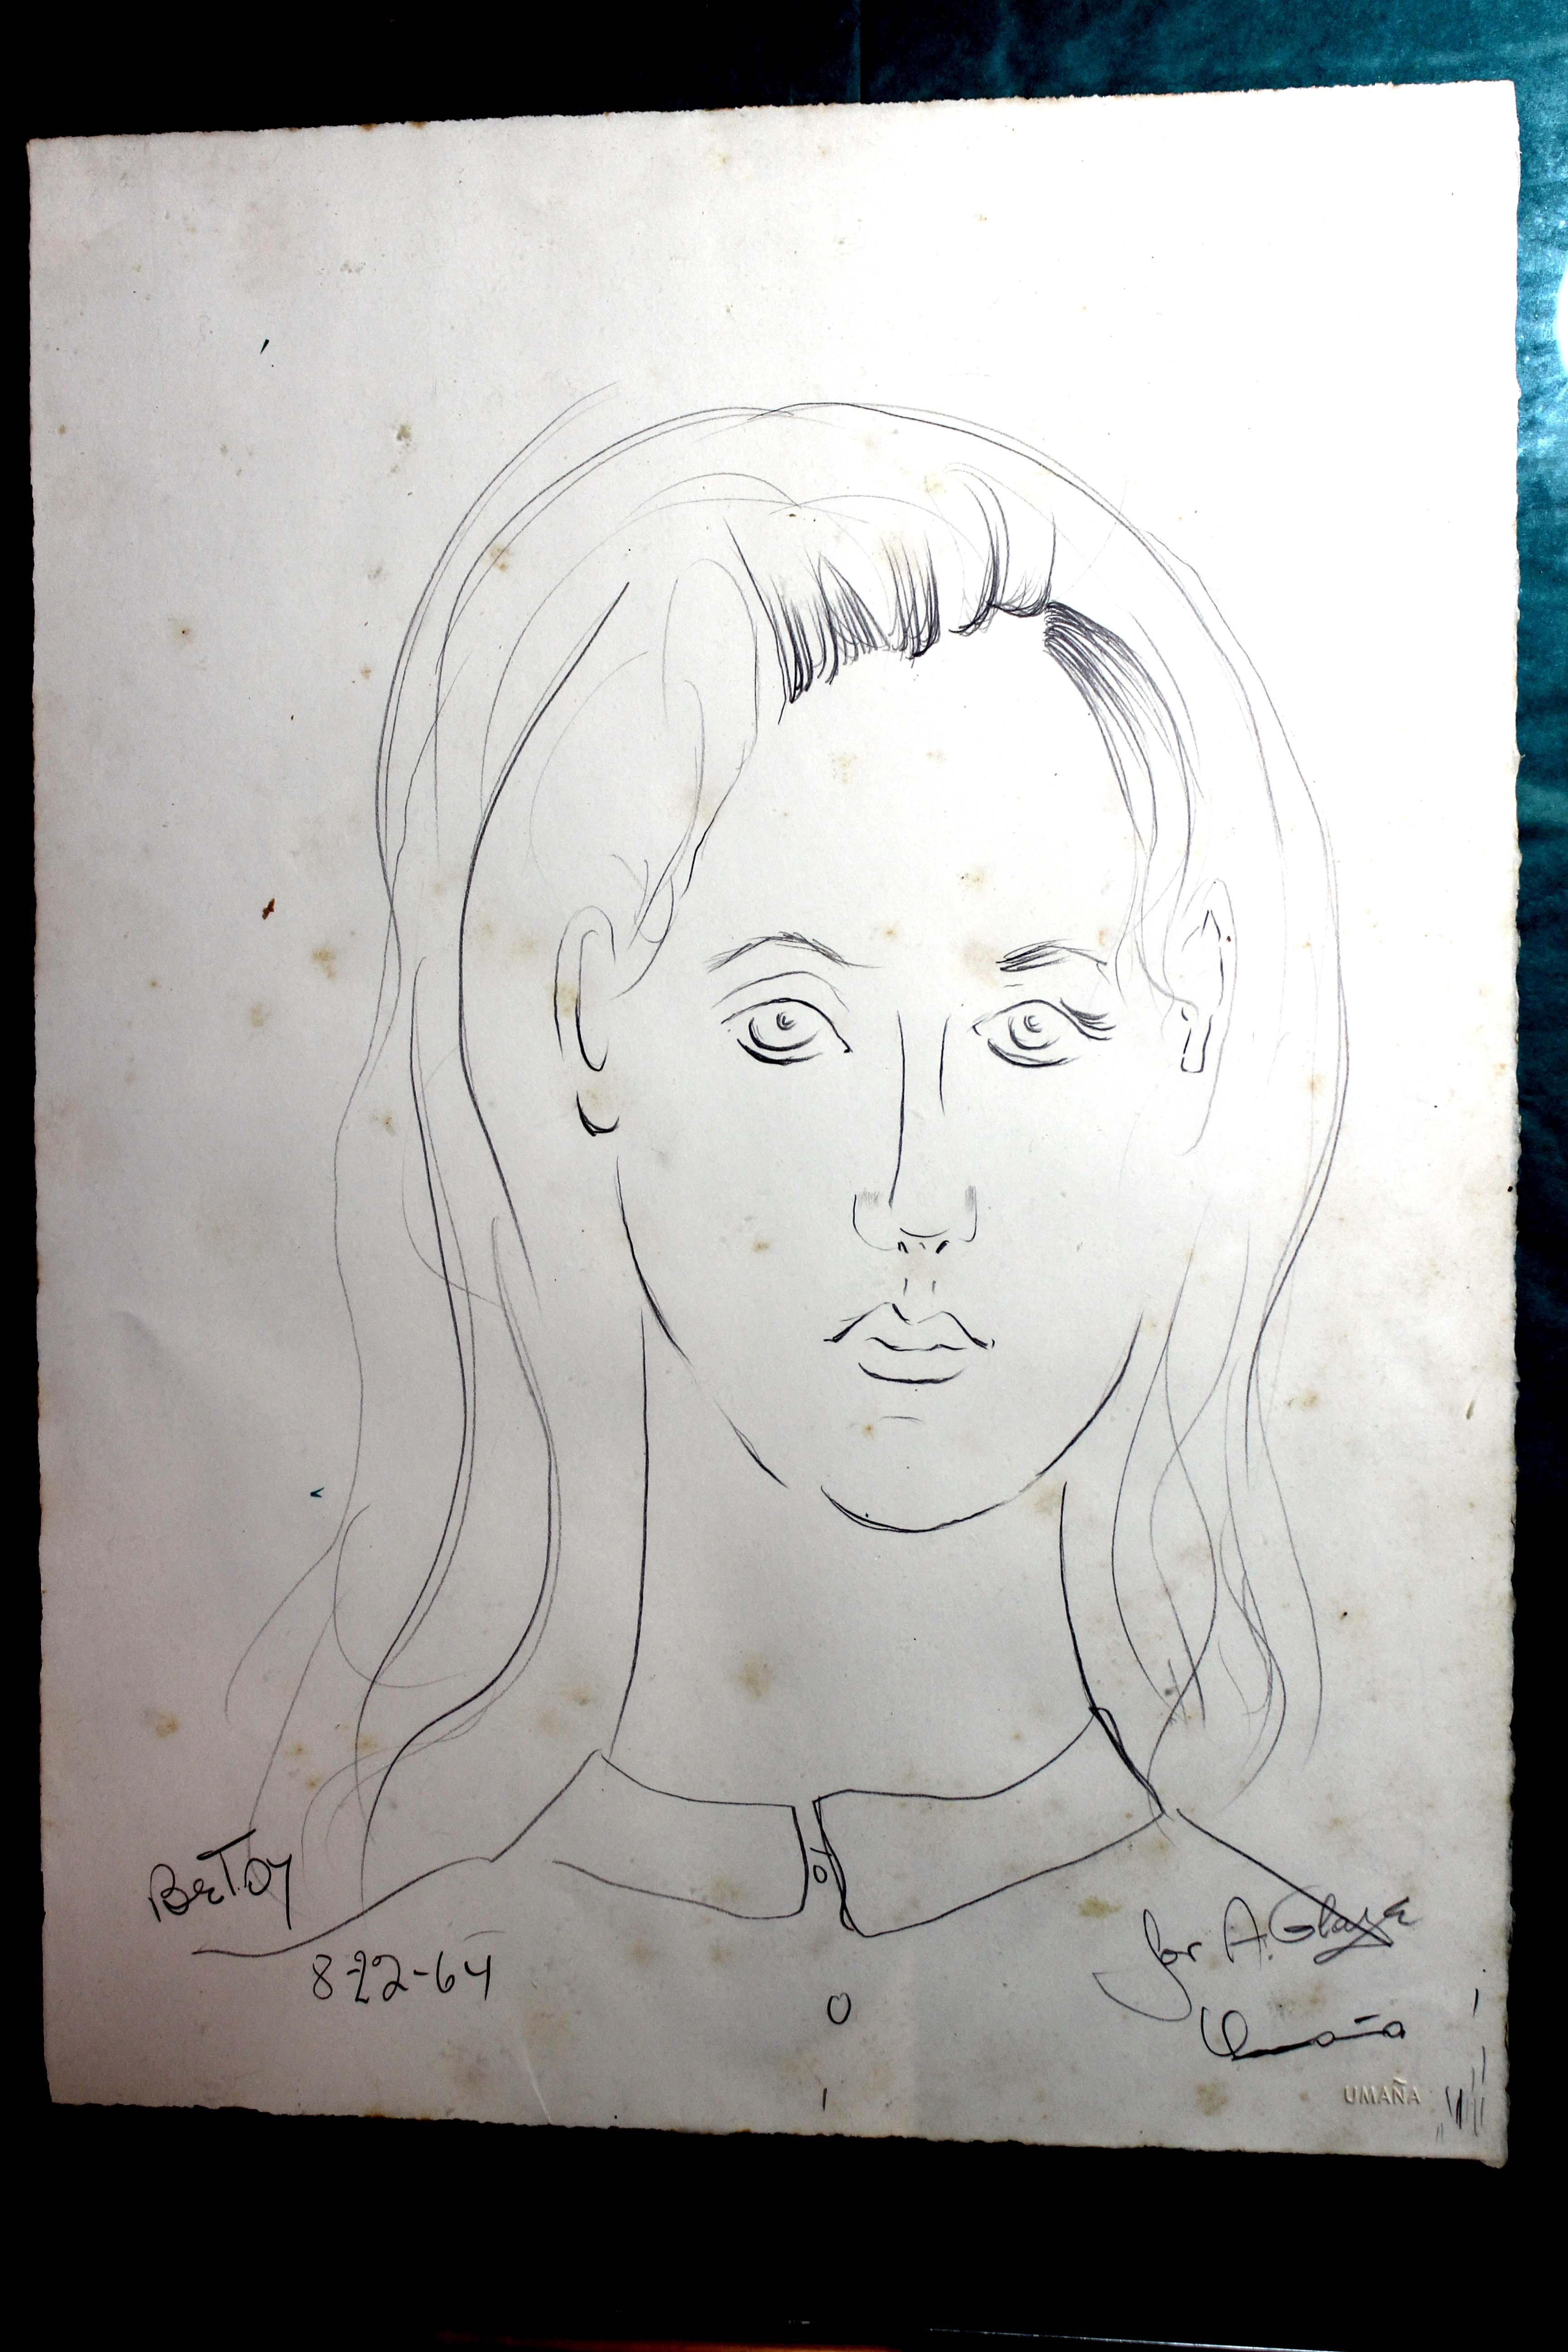 Umana's portrait of Betsy